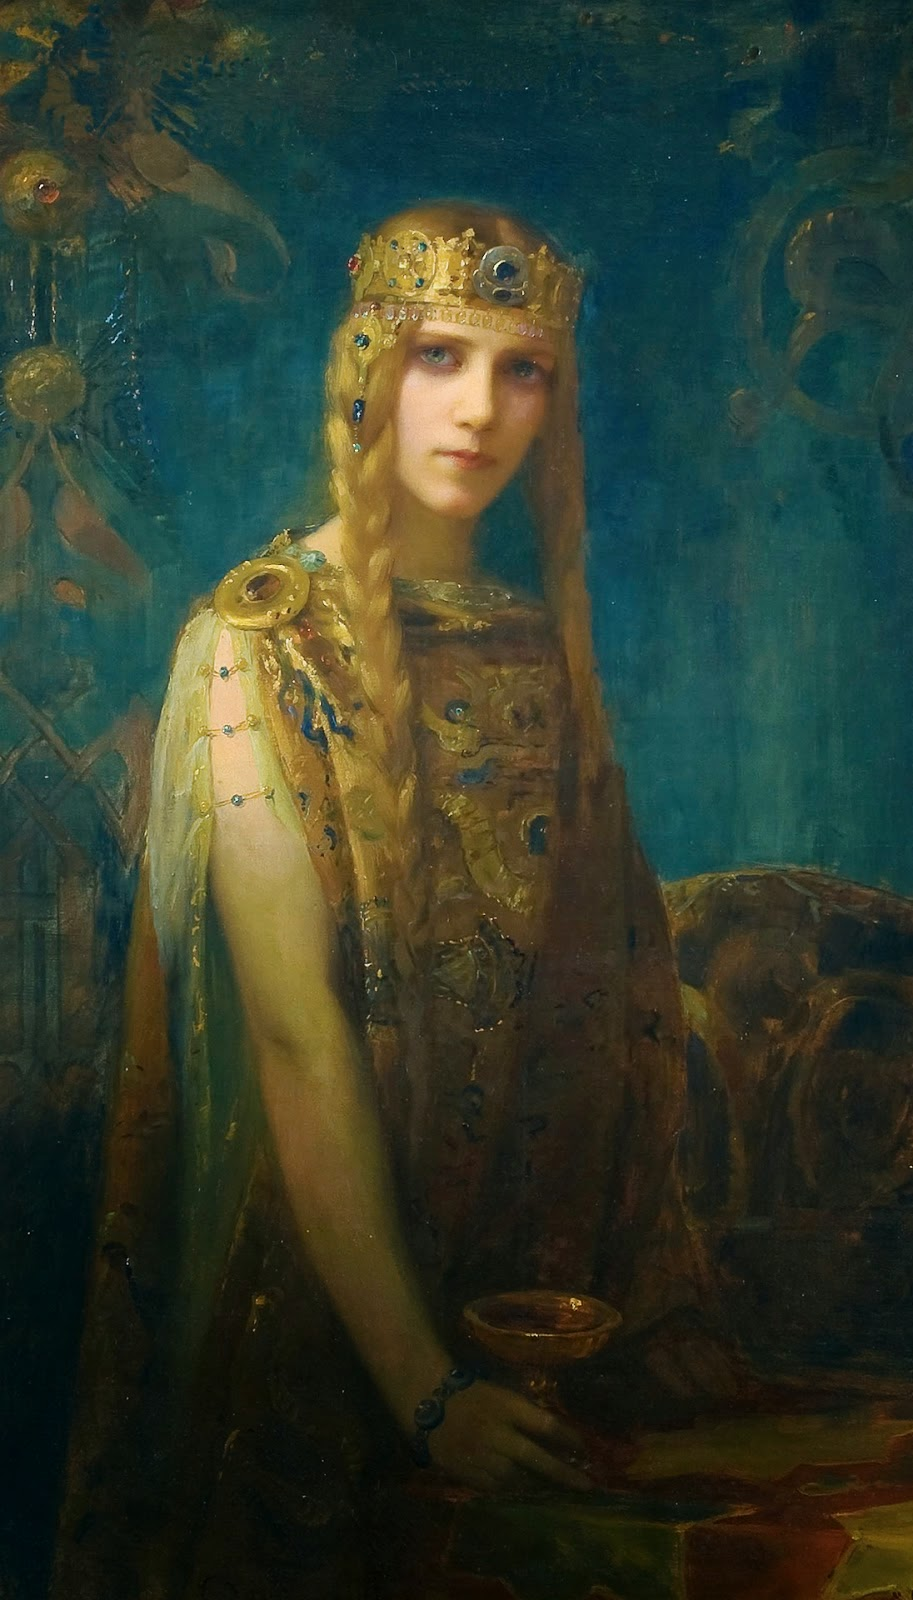 Isolde - Celtic Princess